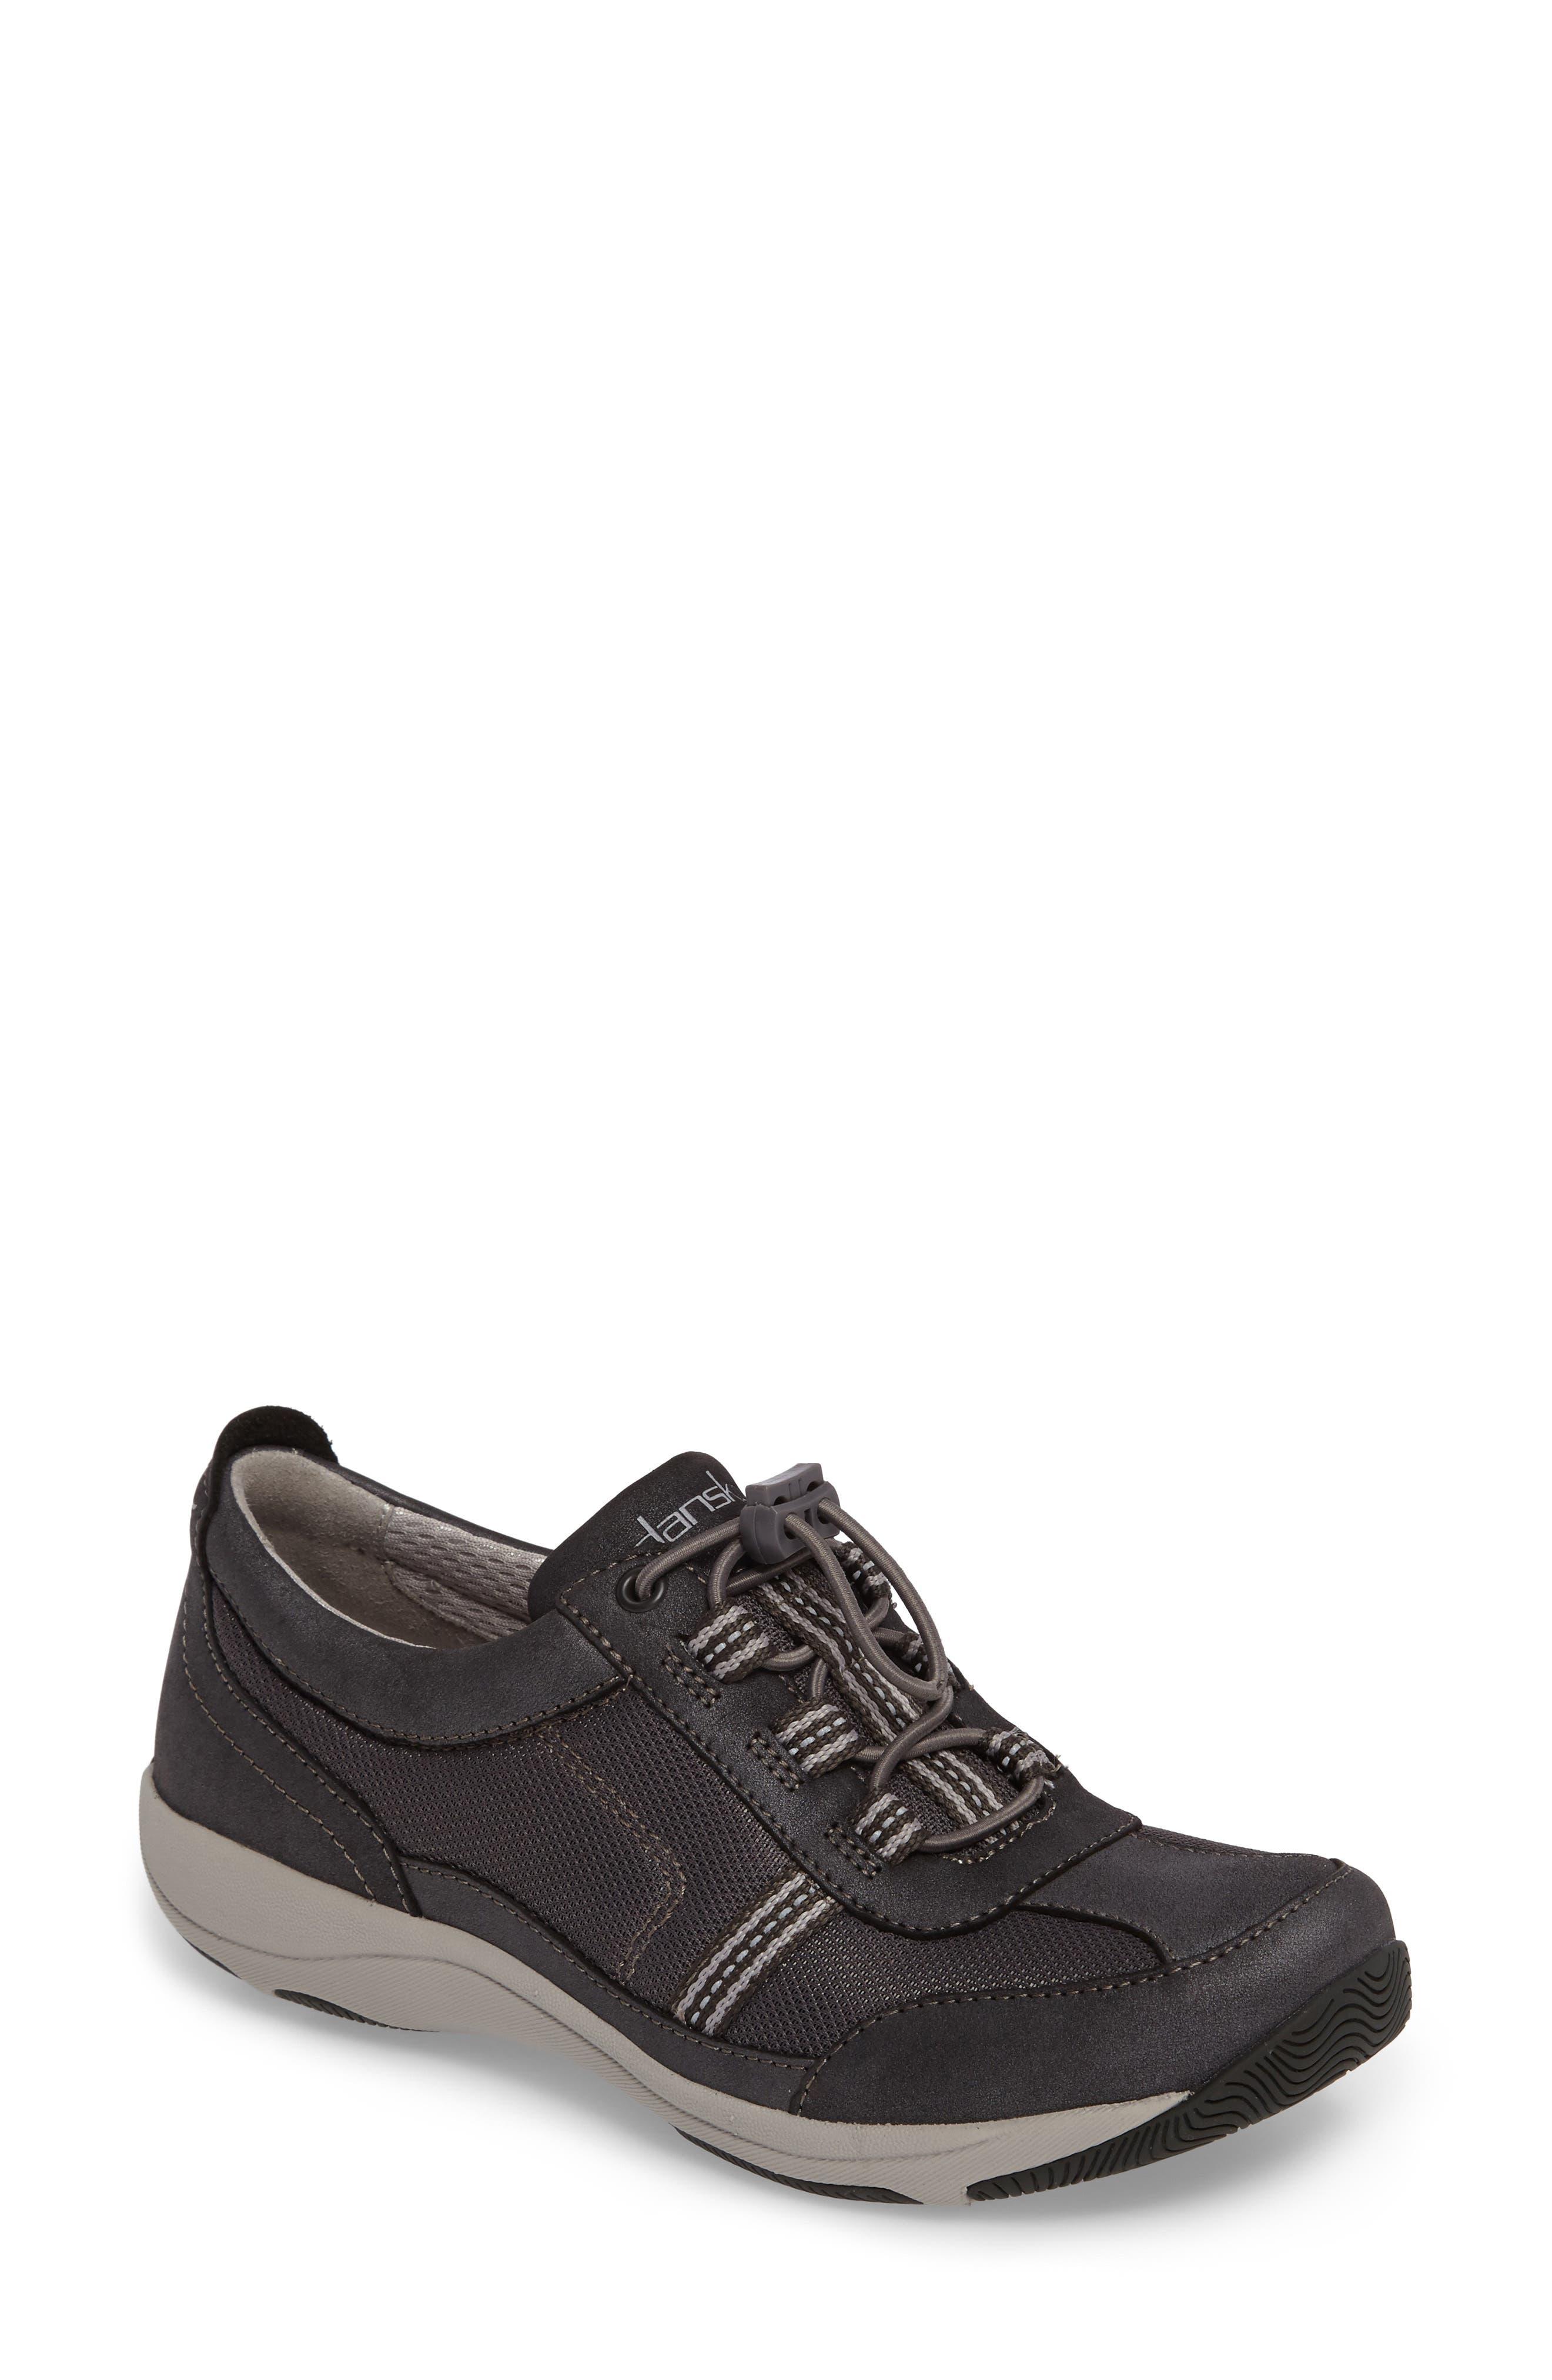 DANSKO 'Helen' Suede & Mesh Sneaker